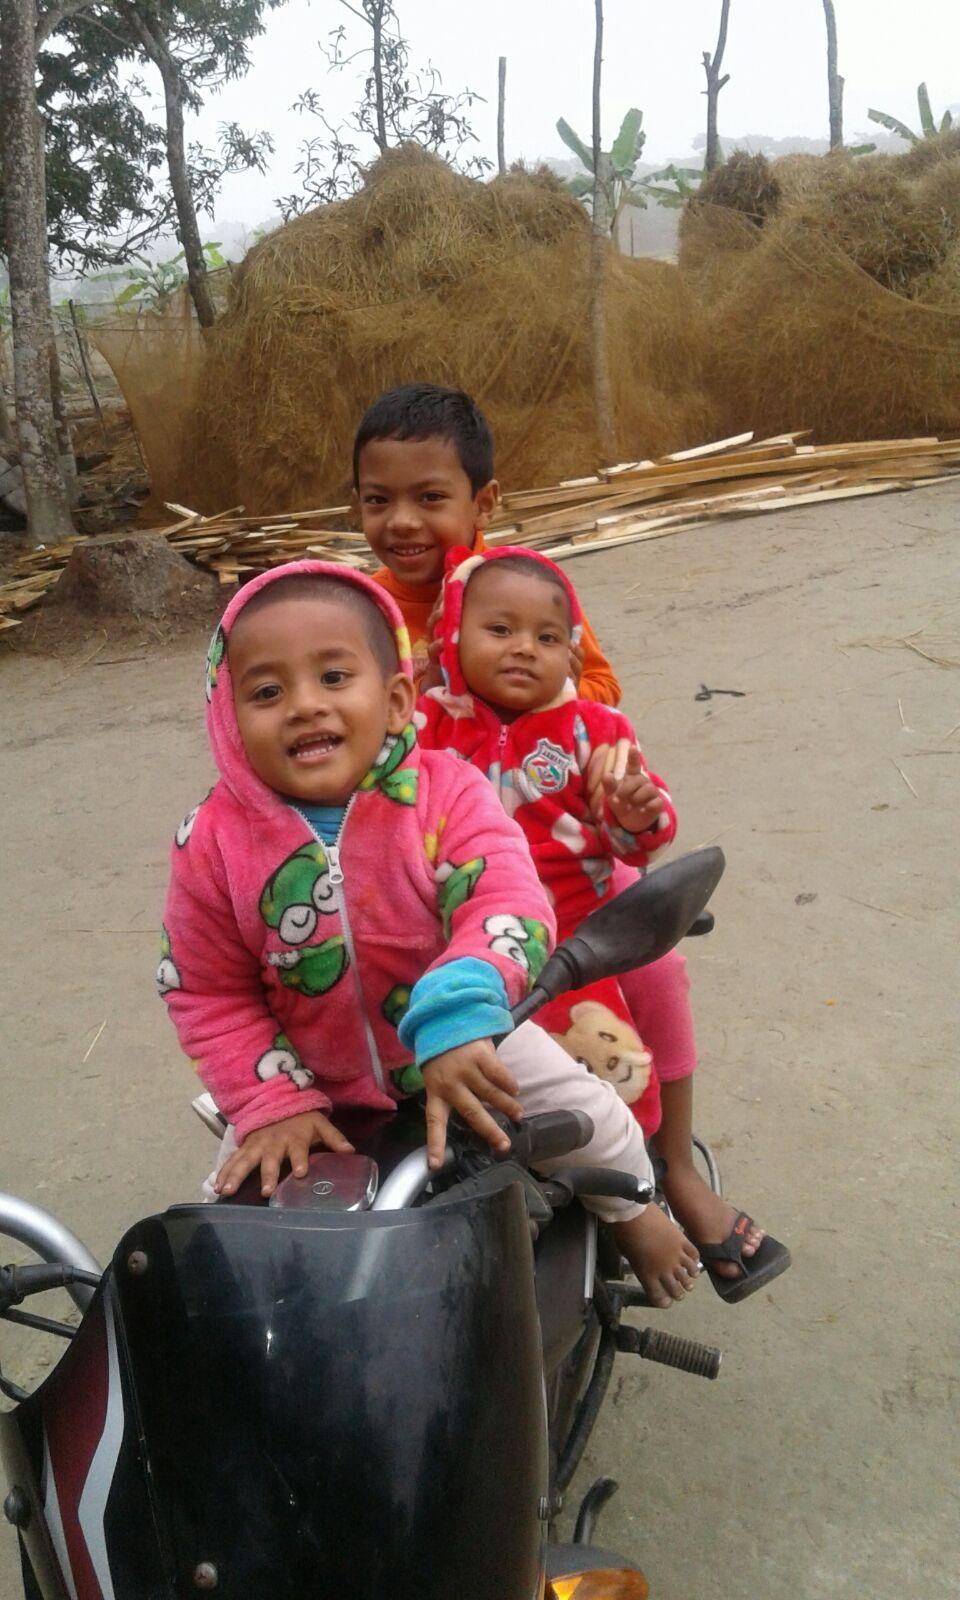 adnan-sa-cousine-tena-son-cousin-rifat-10-janvier-2016-bientot-mon-third-travel-chez-mes-amis-au-bangladesh